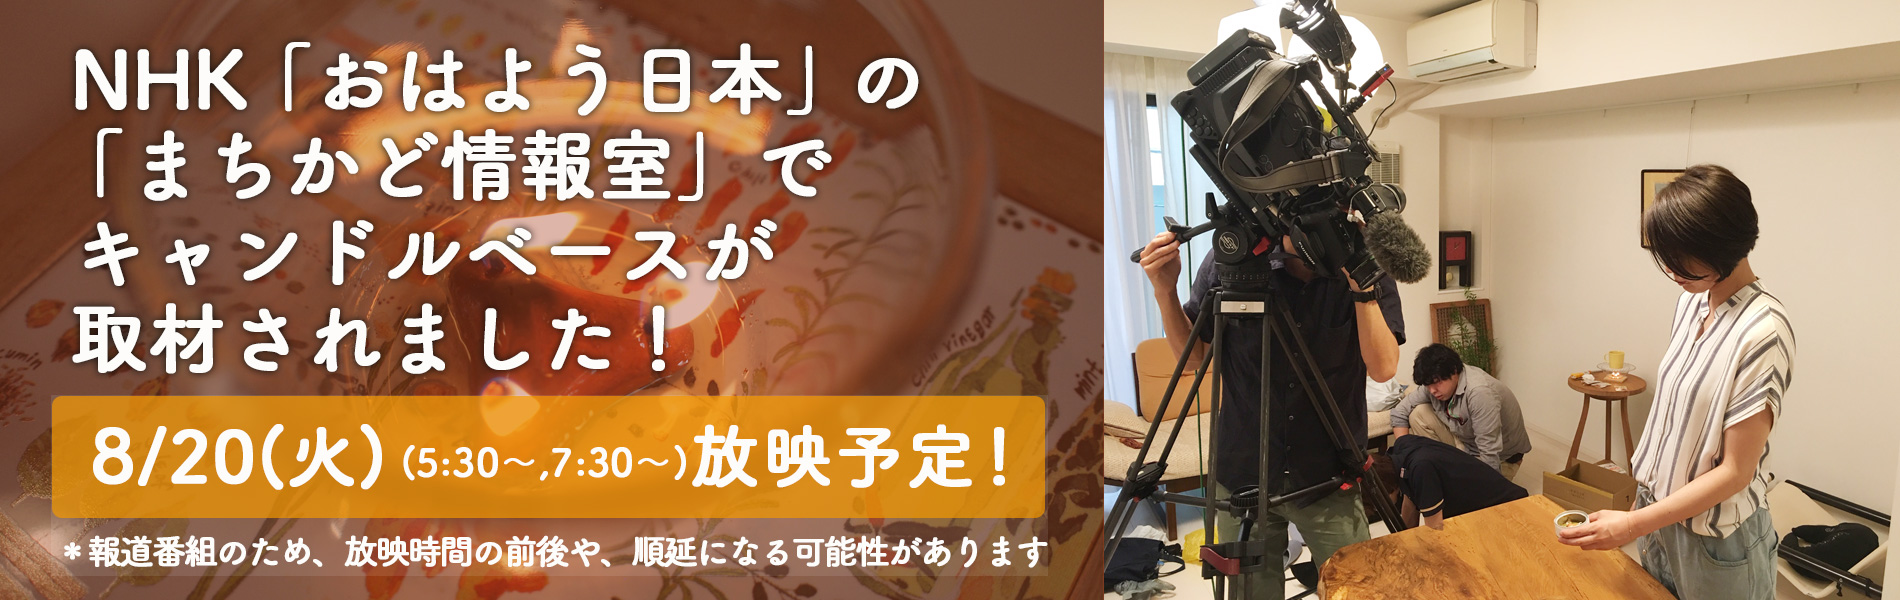 NHKのおはよう日本のまちかど情報室